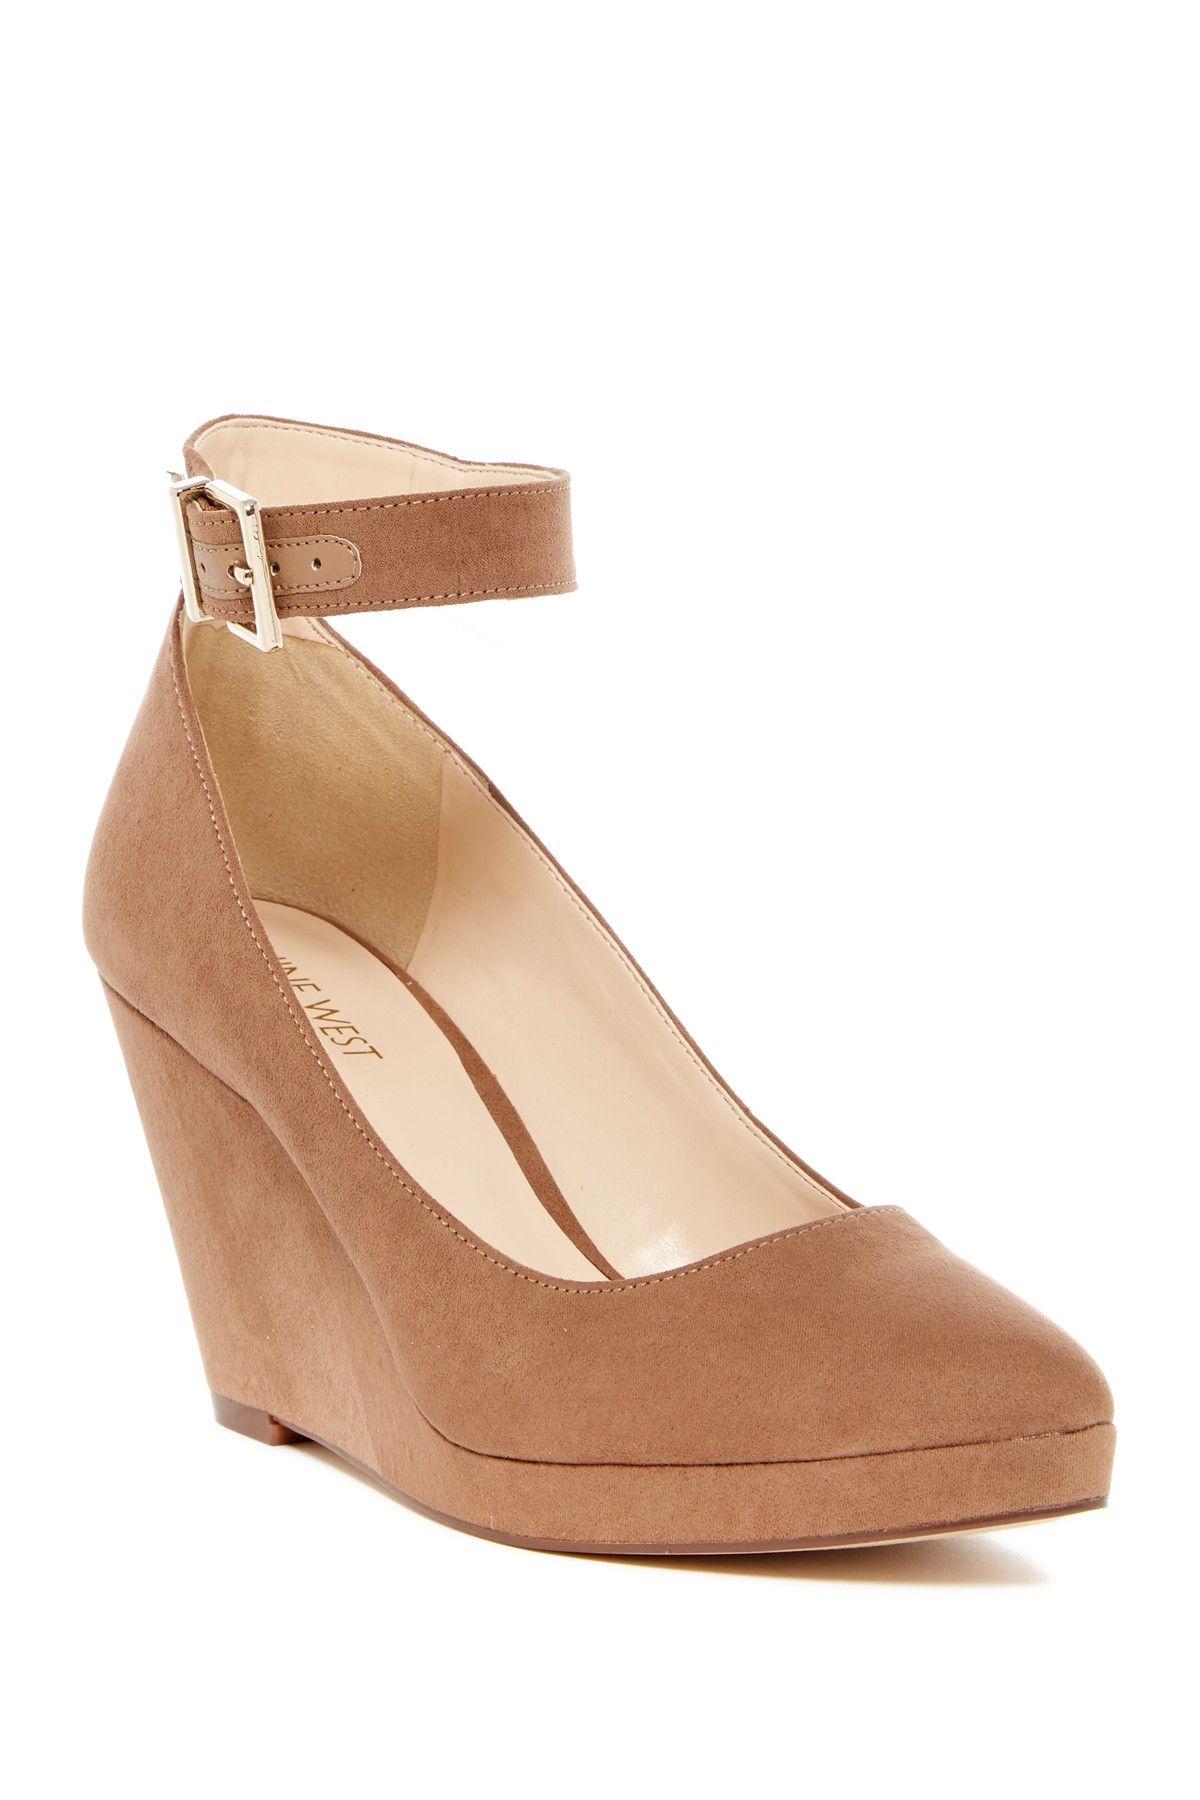 b332f862f Nine West Lucy Lou Wedge Pump | Womens Fashion Street | Wedges ...